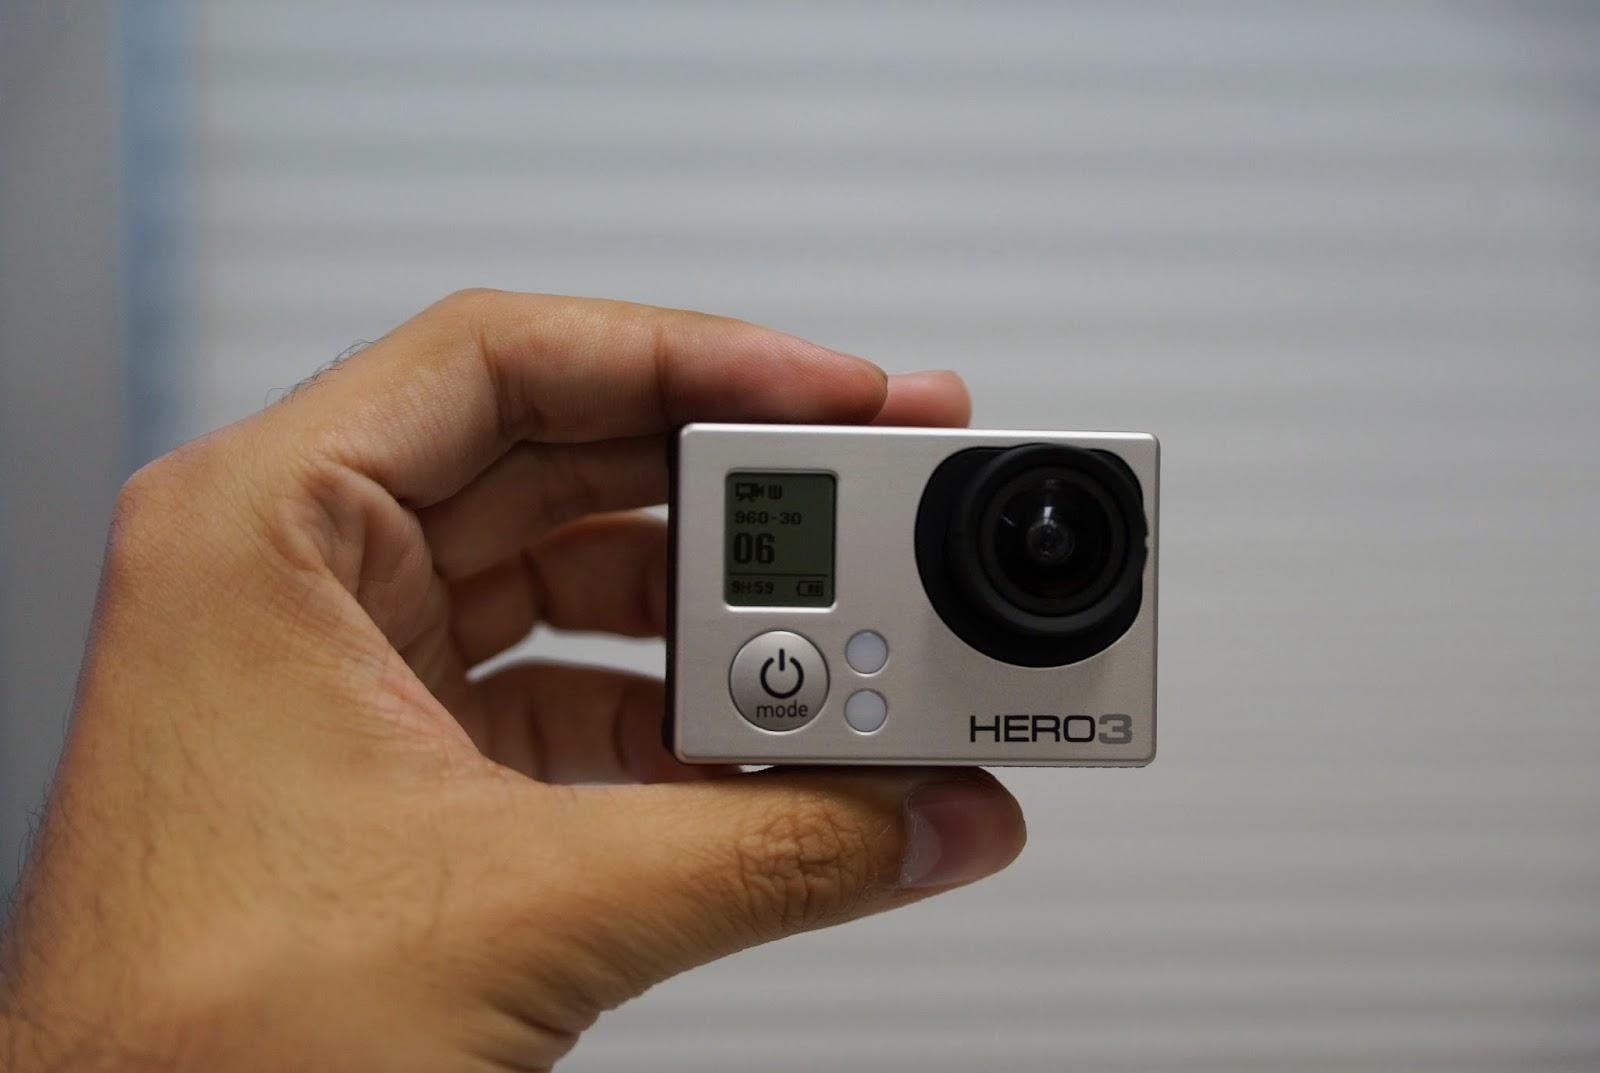 021b082d3ed03 Tá chovendo unicórnio!   3 - Tá sabendo  - Polaroid Cube vs. GoPro